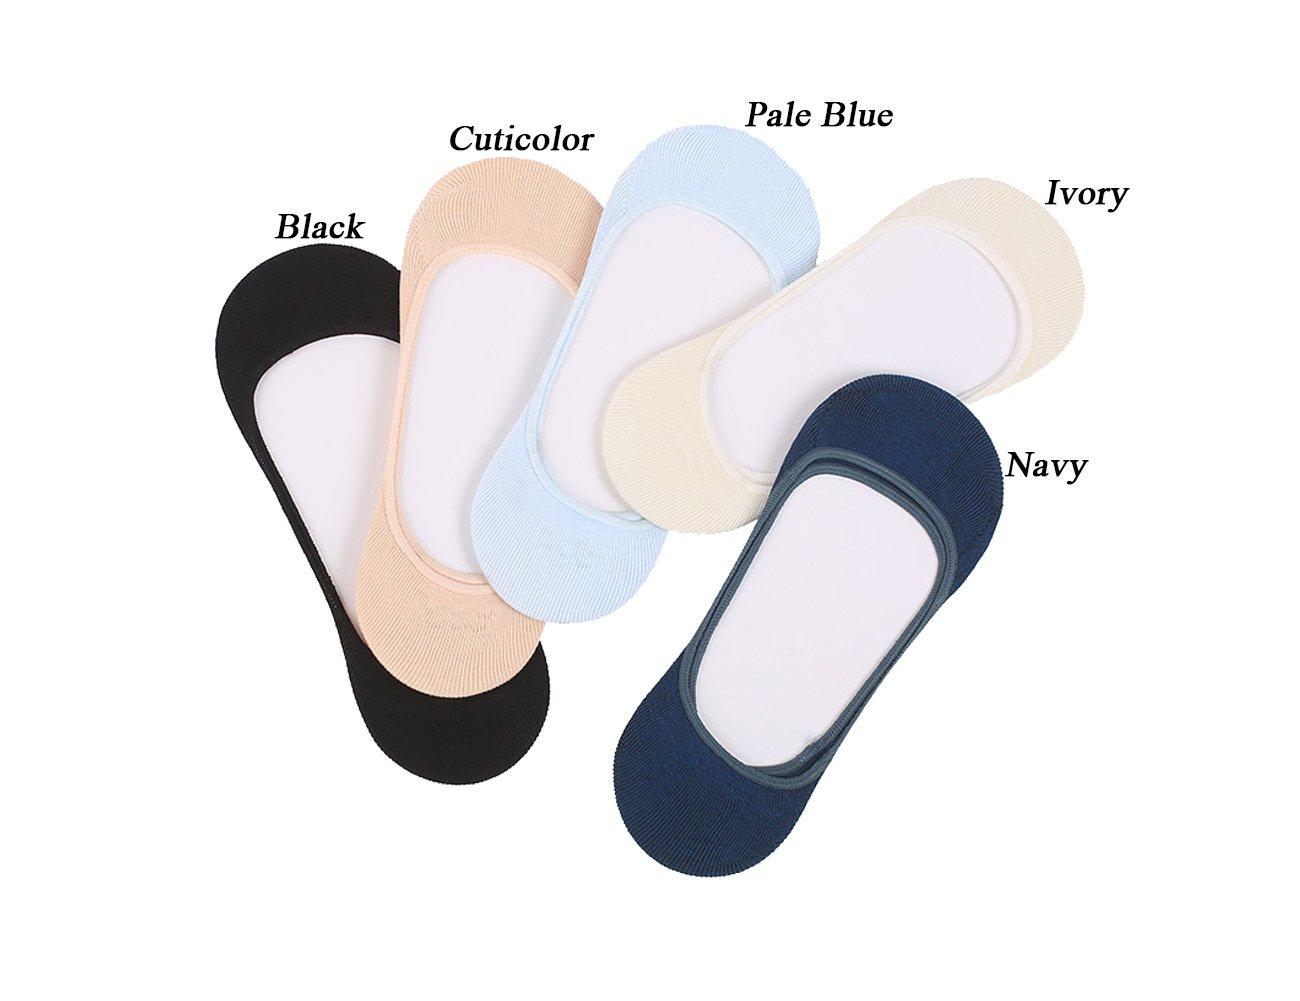 Women No Show Socks Cotton Liner Socks Non-Slip No Show Socks Low Cut Boat Socks 5-Pairs by Ayiran (Image #3)